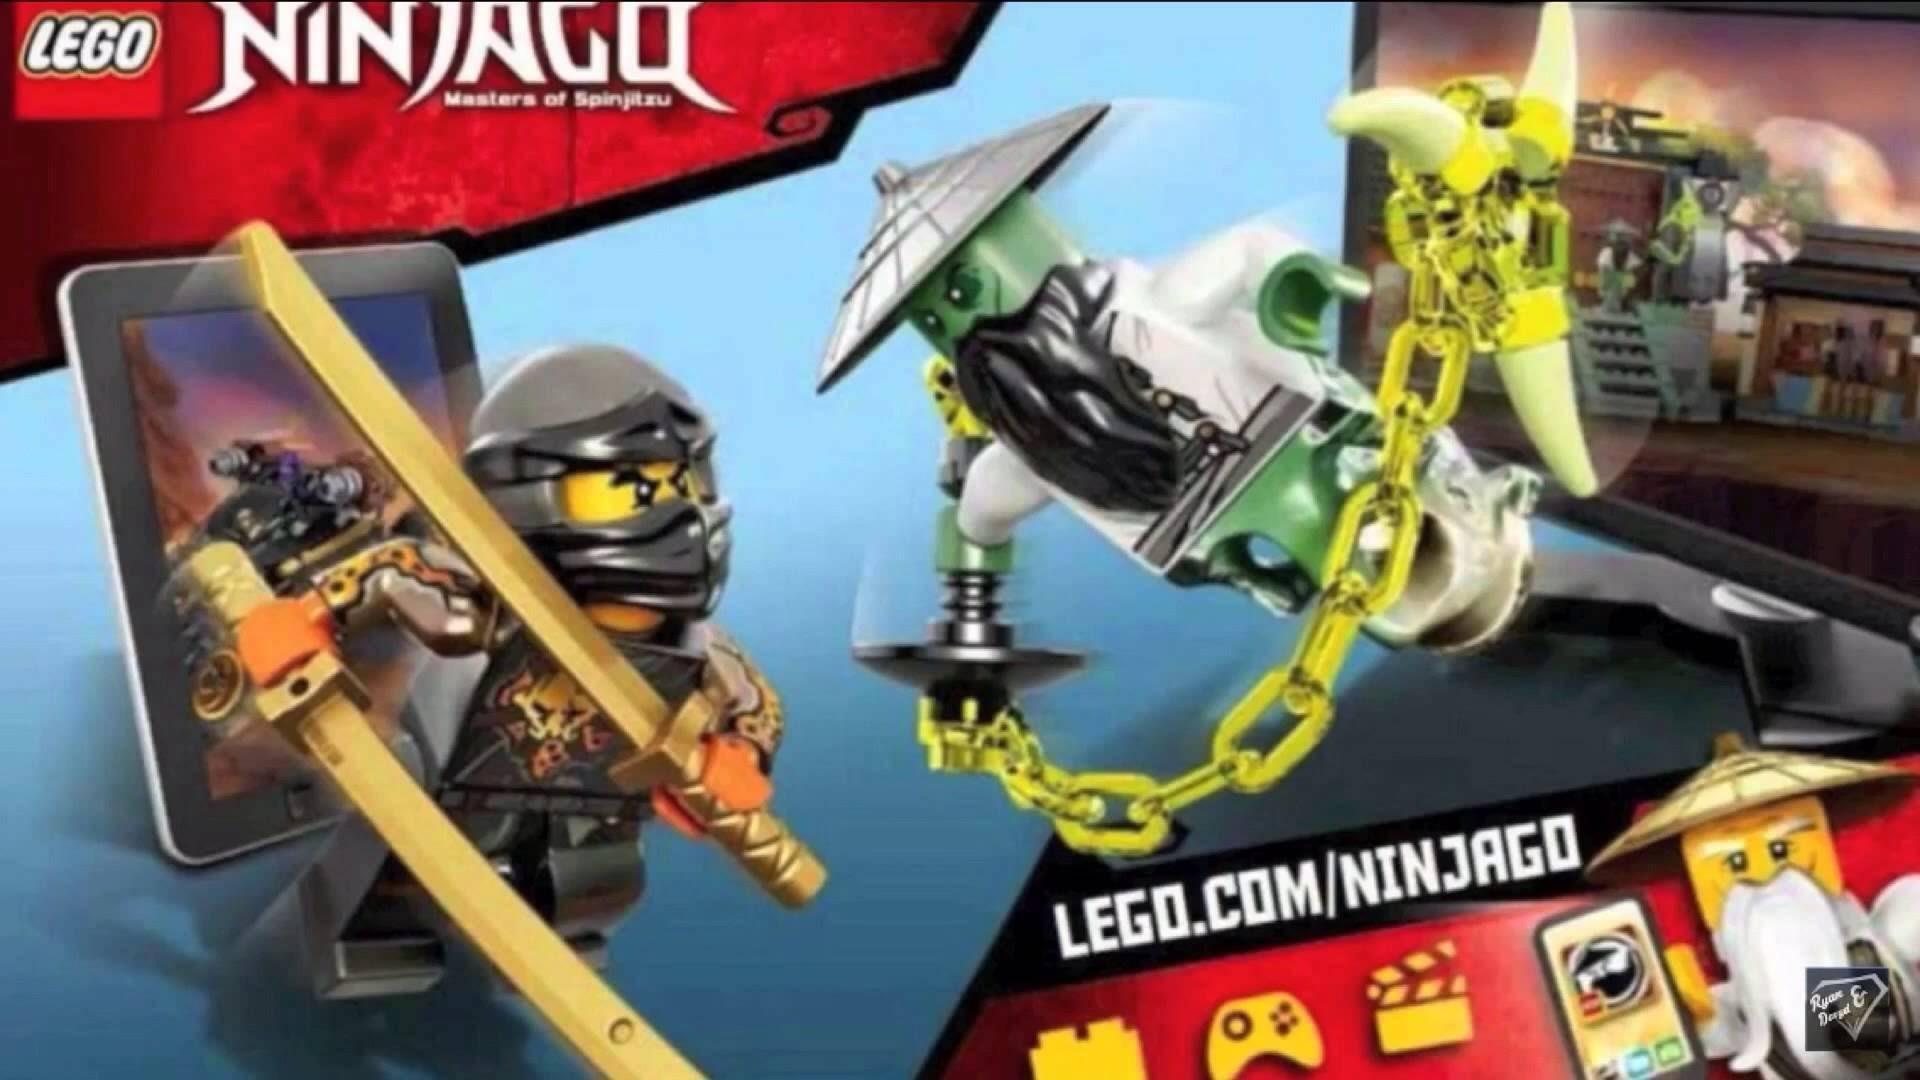 1080x1920 chell valentine wallpaper lego dimensions - Legocom Ninjago